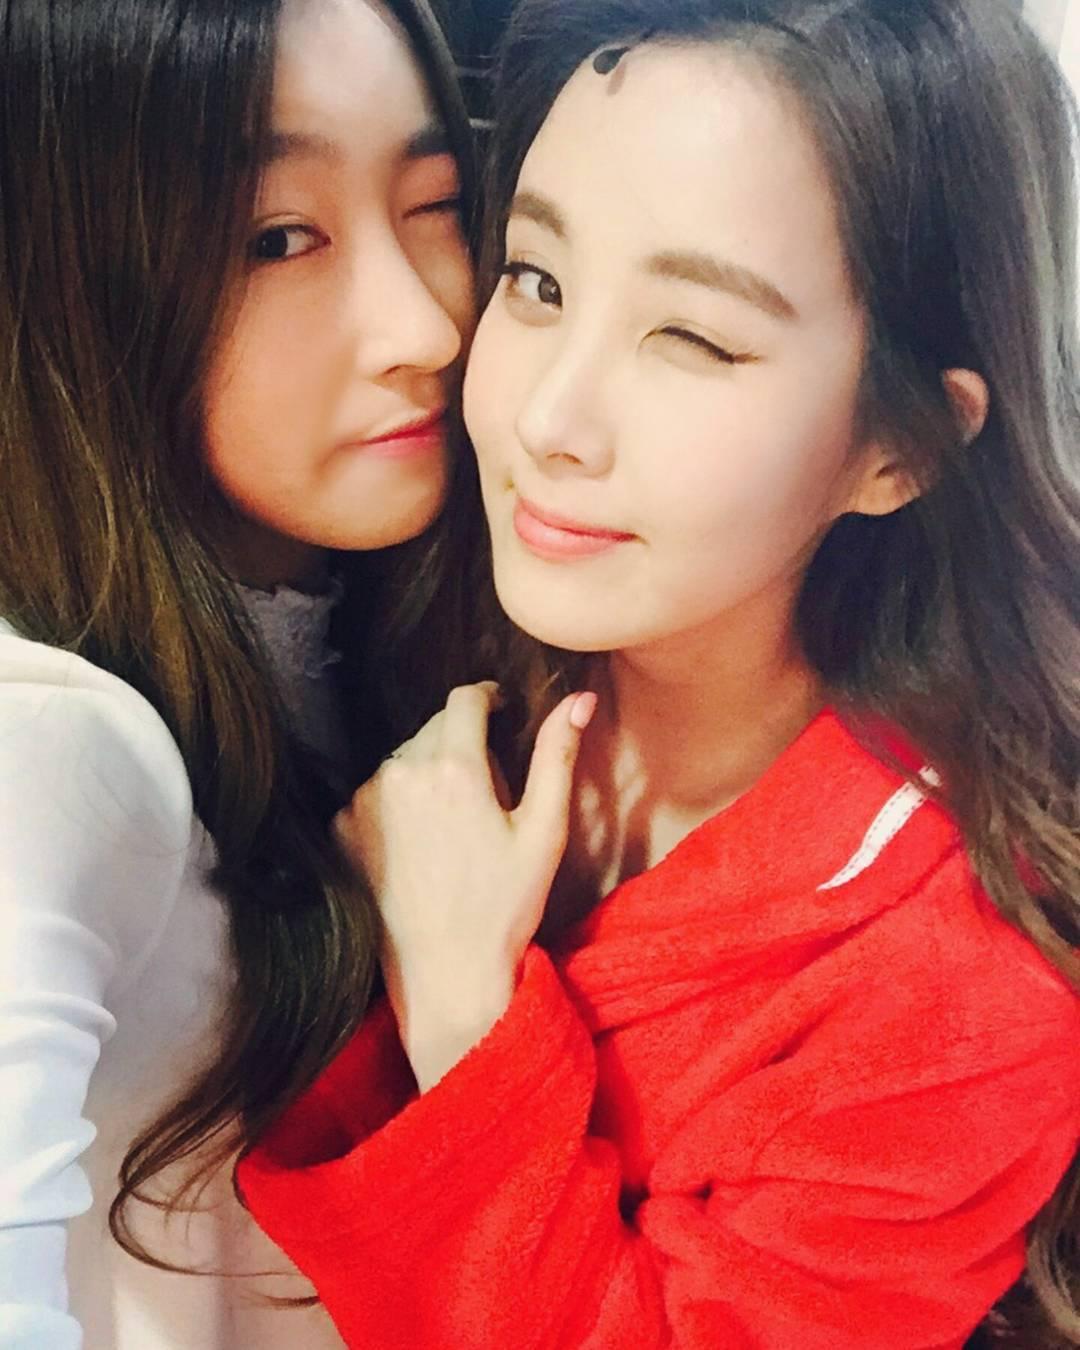 Lee hwan hee and seohyun dating